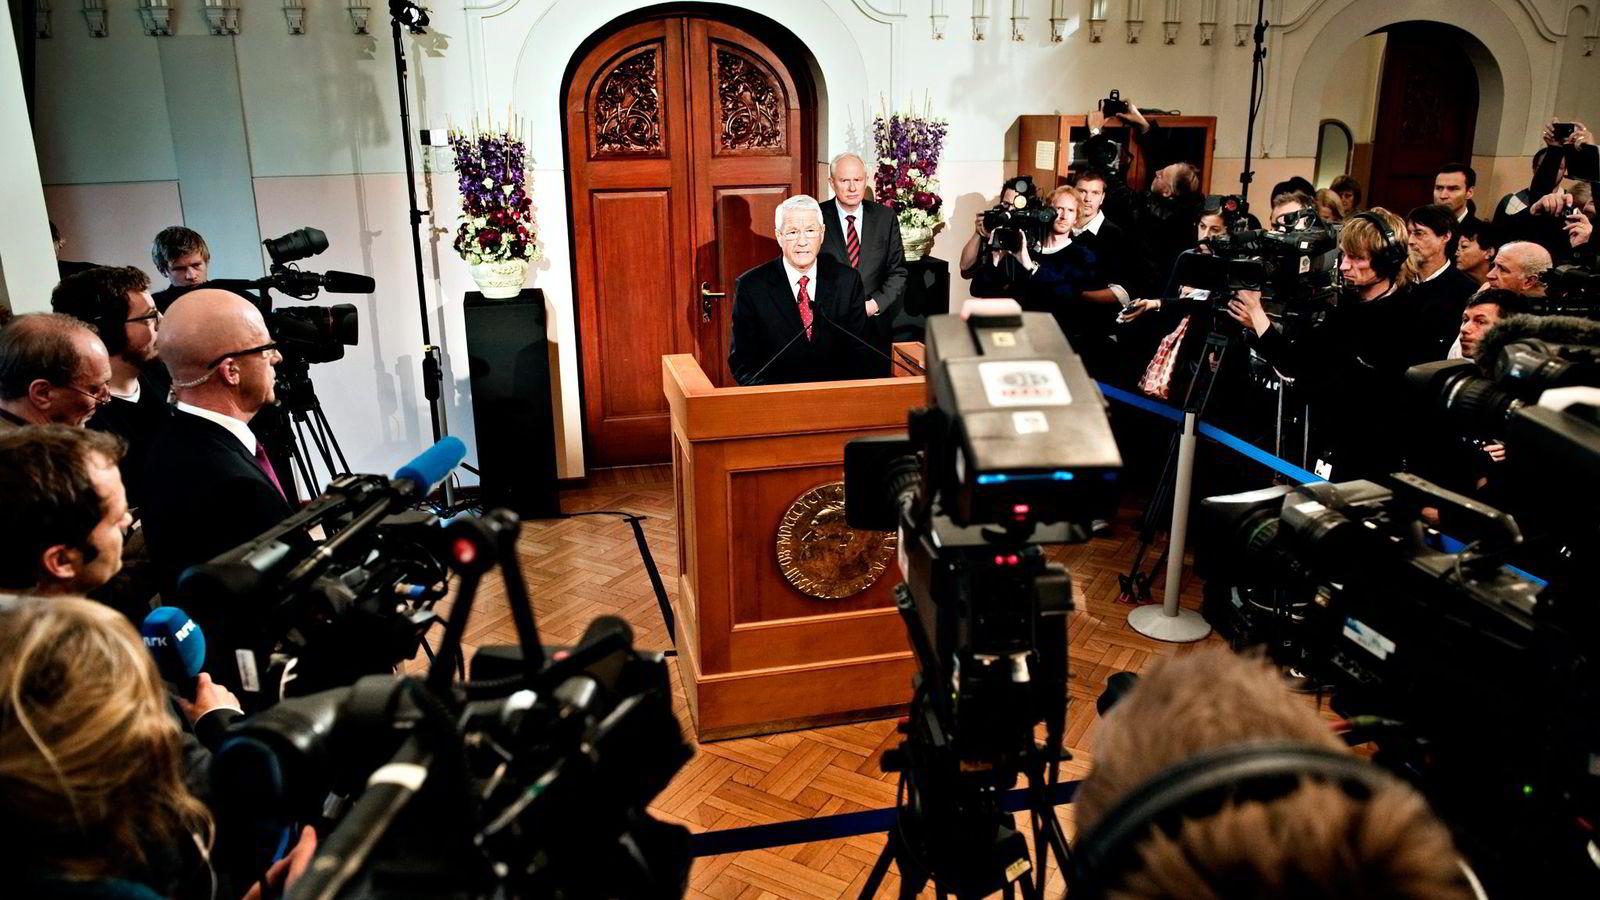 TID FOR ENDRING. Nobelkomiteens leder Thorbjørn Jagland kunngjør fredsprisen for 2010. Til høyre bak står dirketør Geir Lundestad i Det norske Nobelinstituttet.